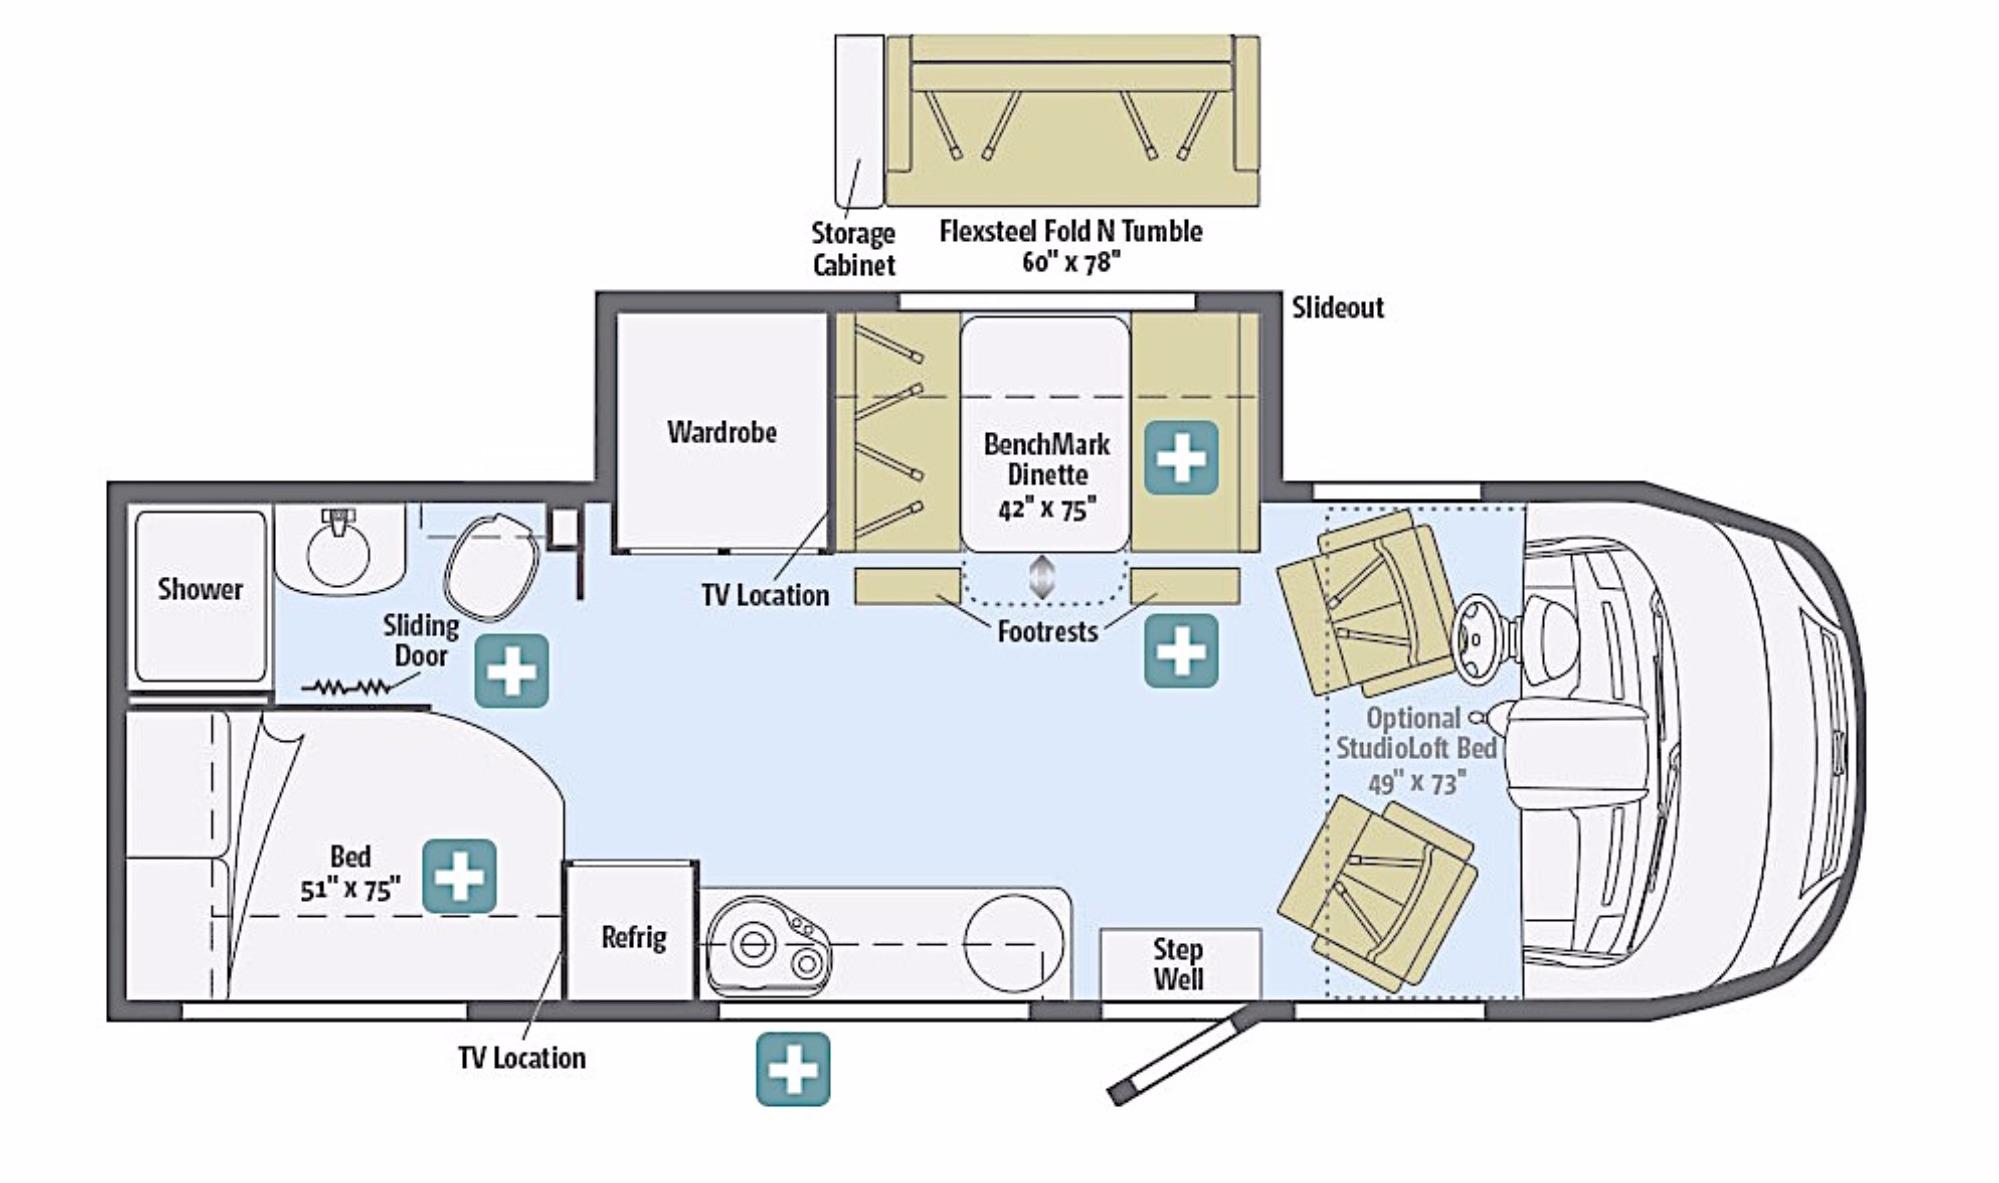 View Floor Plan for 2016 WINNEBAGO VIA 25P